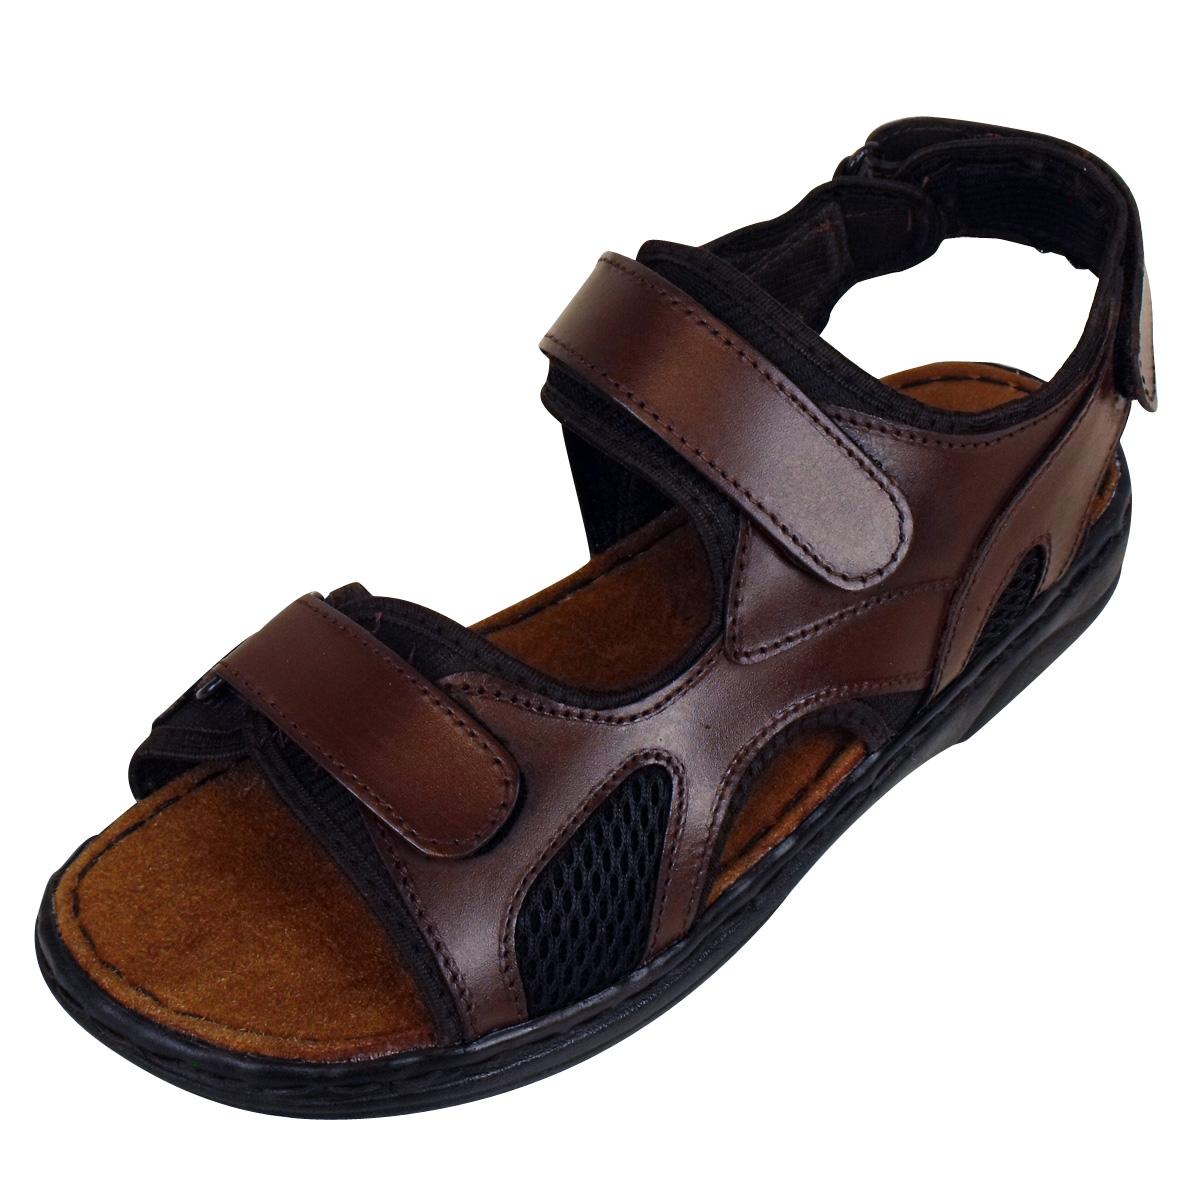 mens leather smart slip on sandal mules sandals